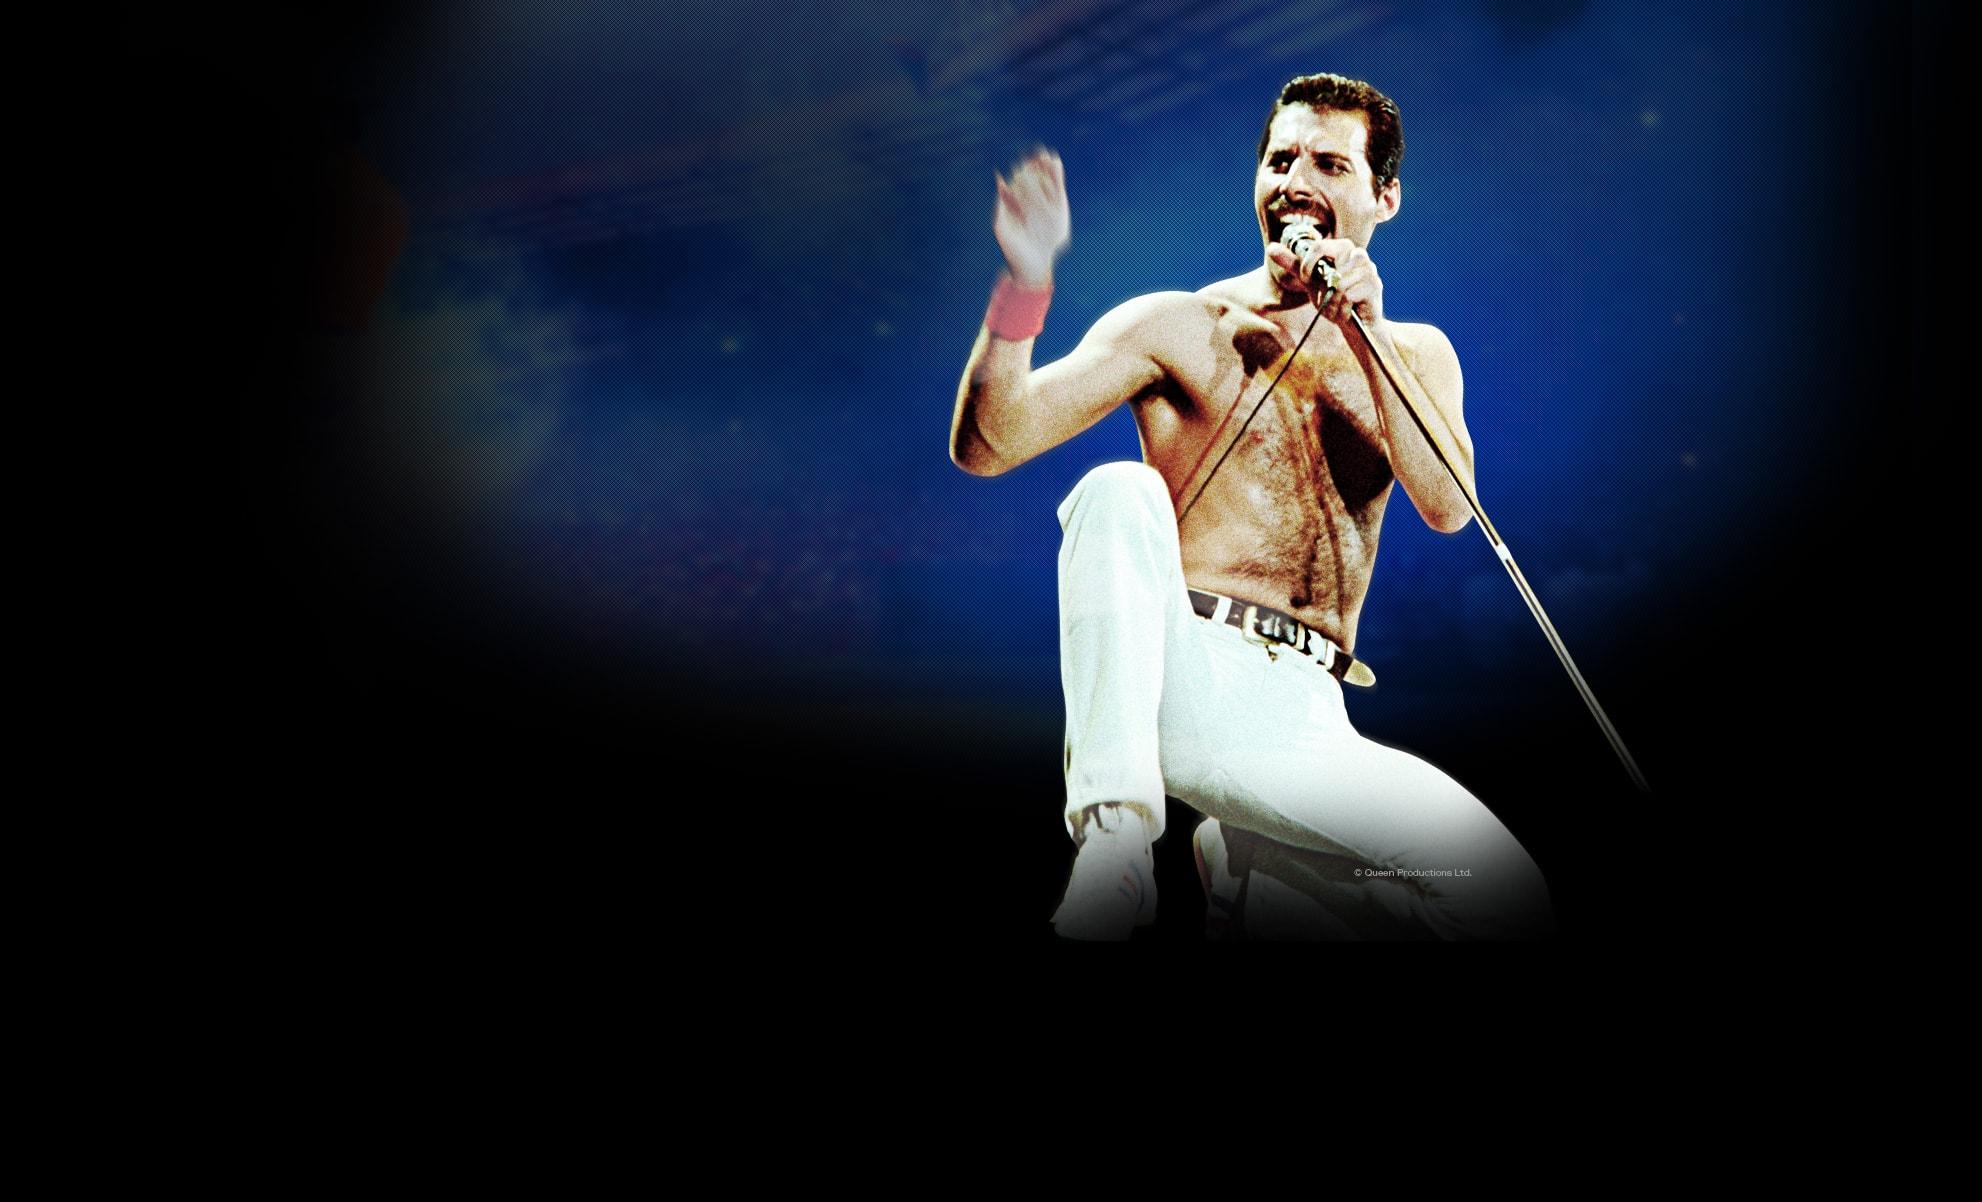 Freddie Mercury free wallpaper